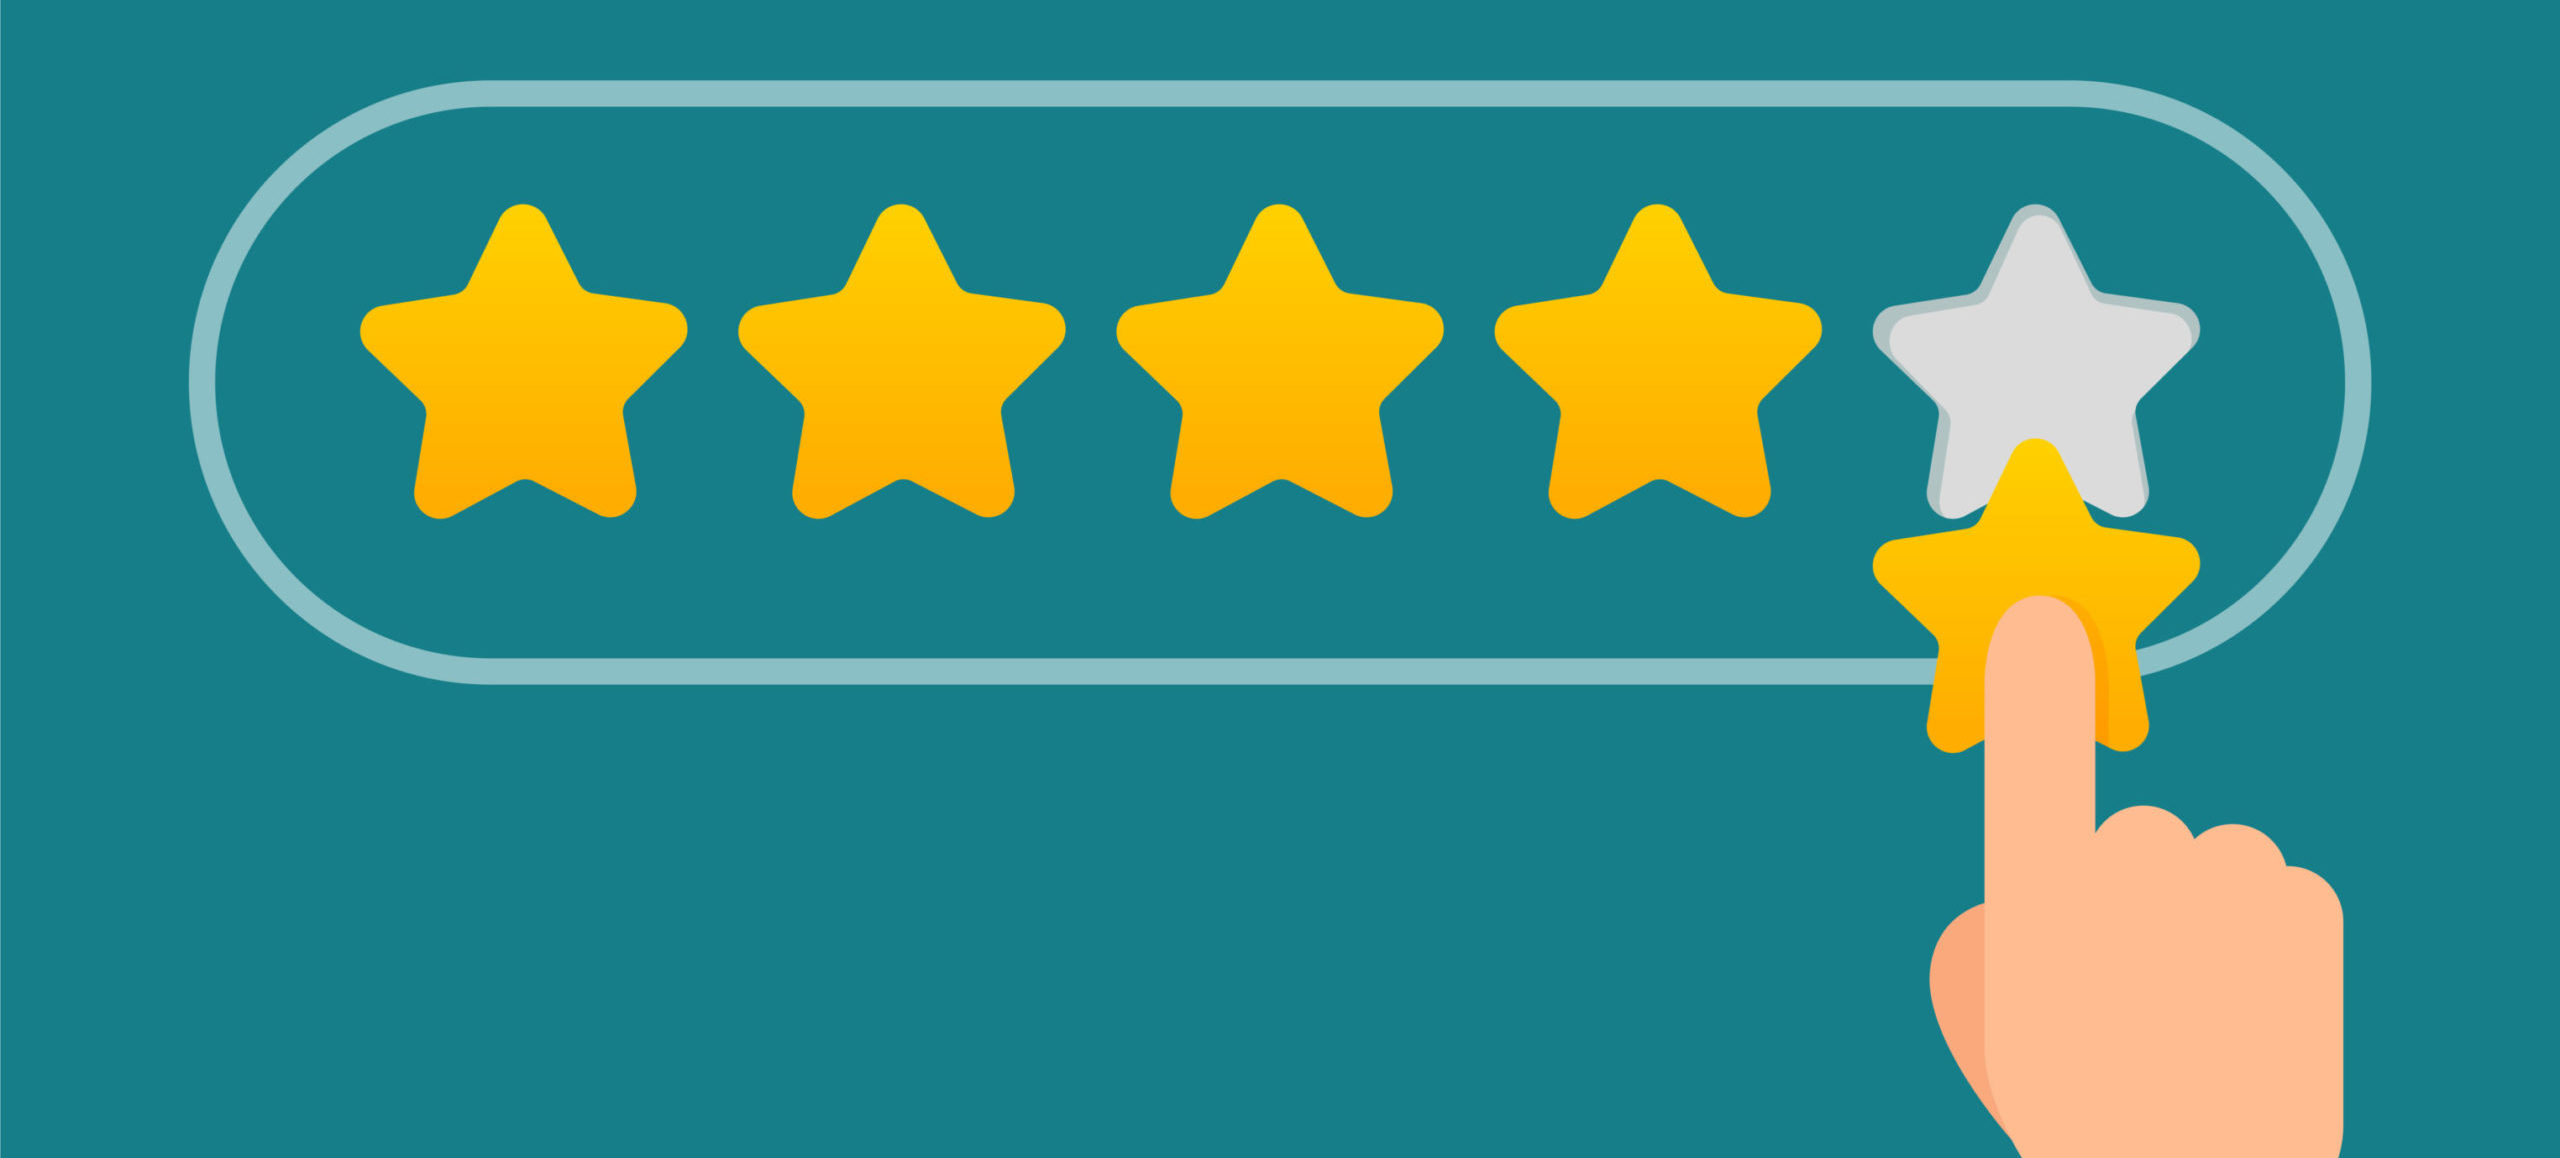 Customer satisfaction level